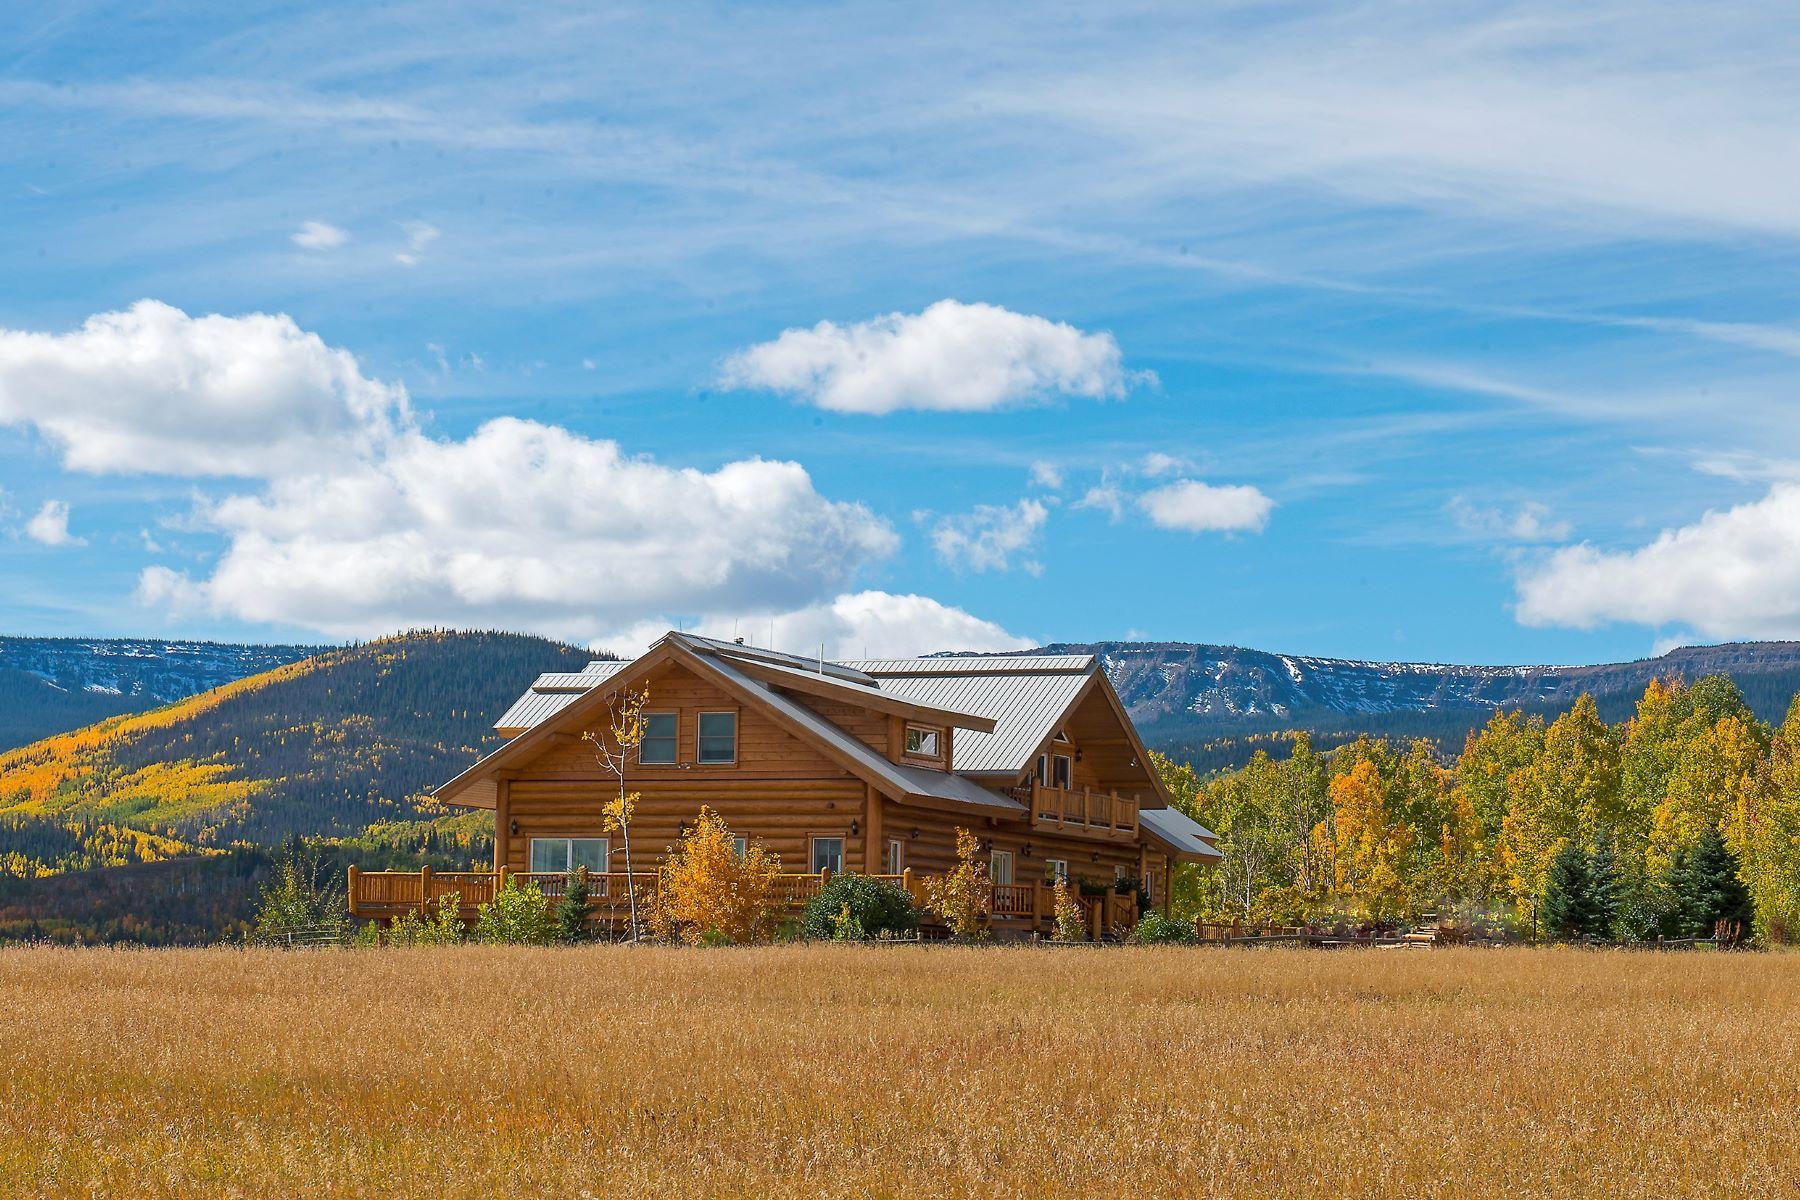 Fazenda / Rancho / Plantação para Venda às Magnificent Rocky Mountain Ranch TBD RCR 15 Yampa, Colorado, 80483 Estados Unidos